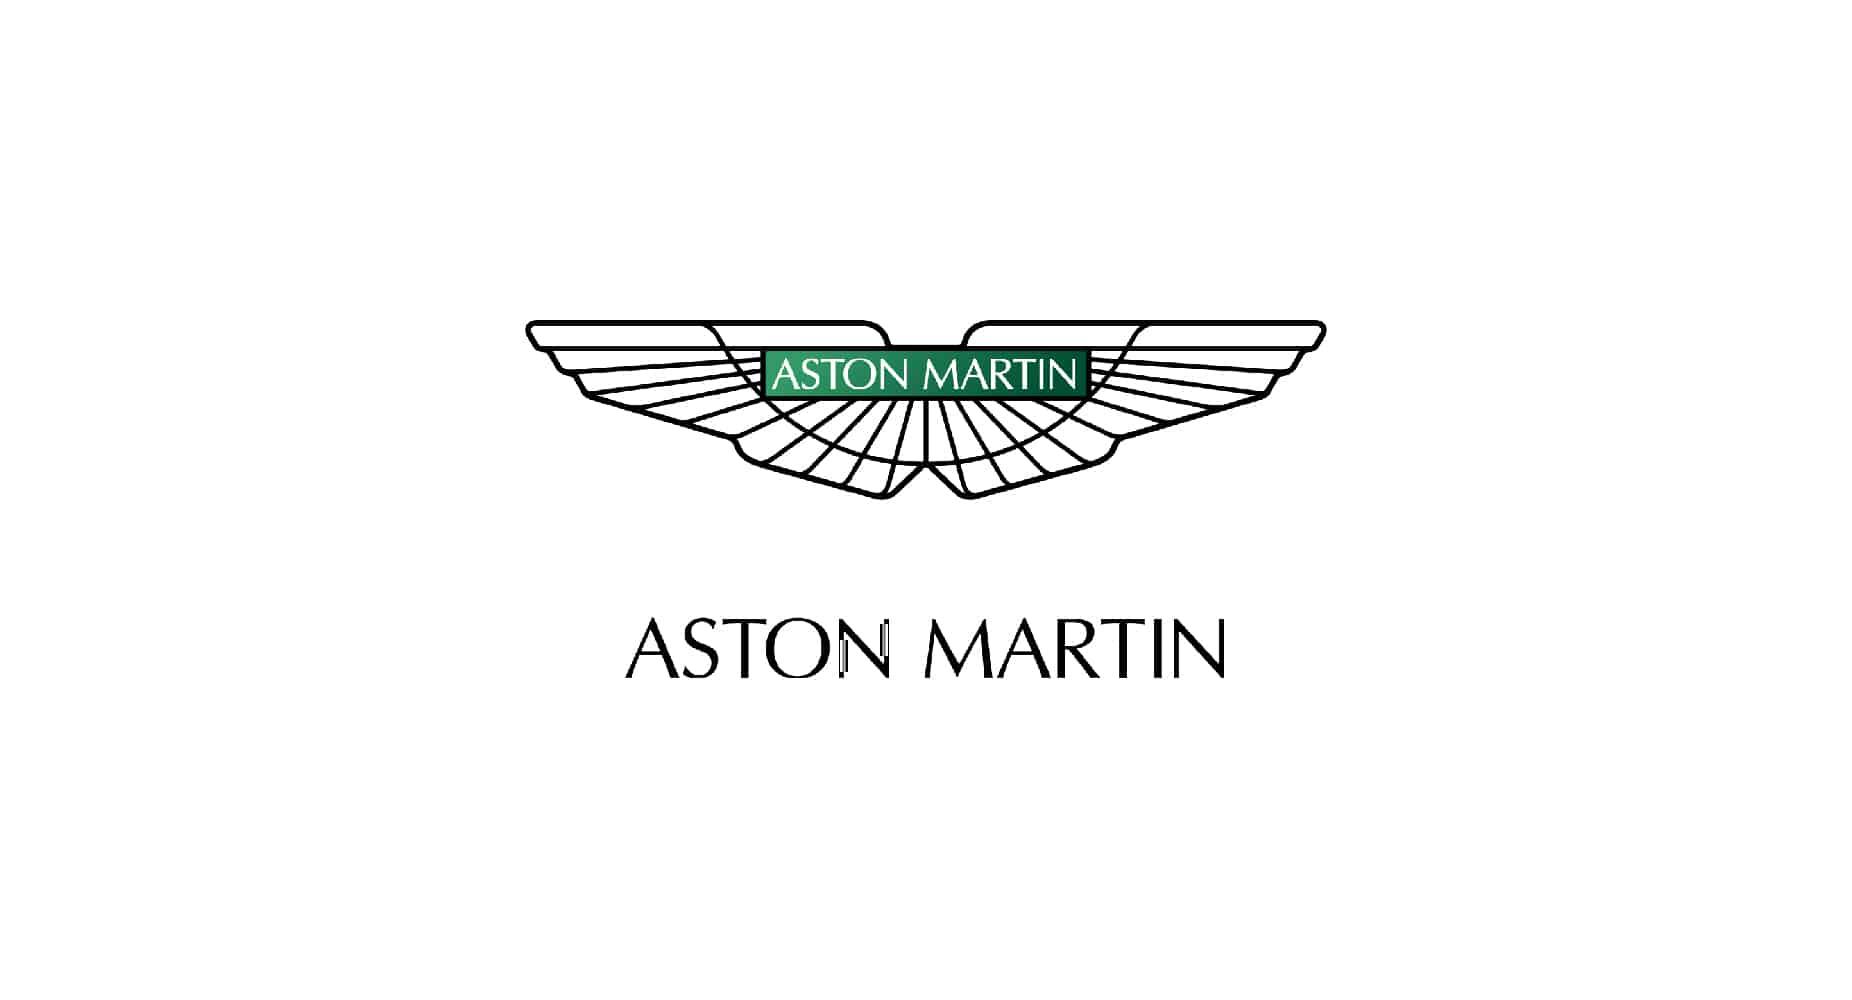 aston martin branding